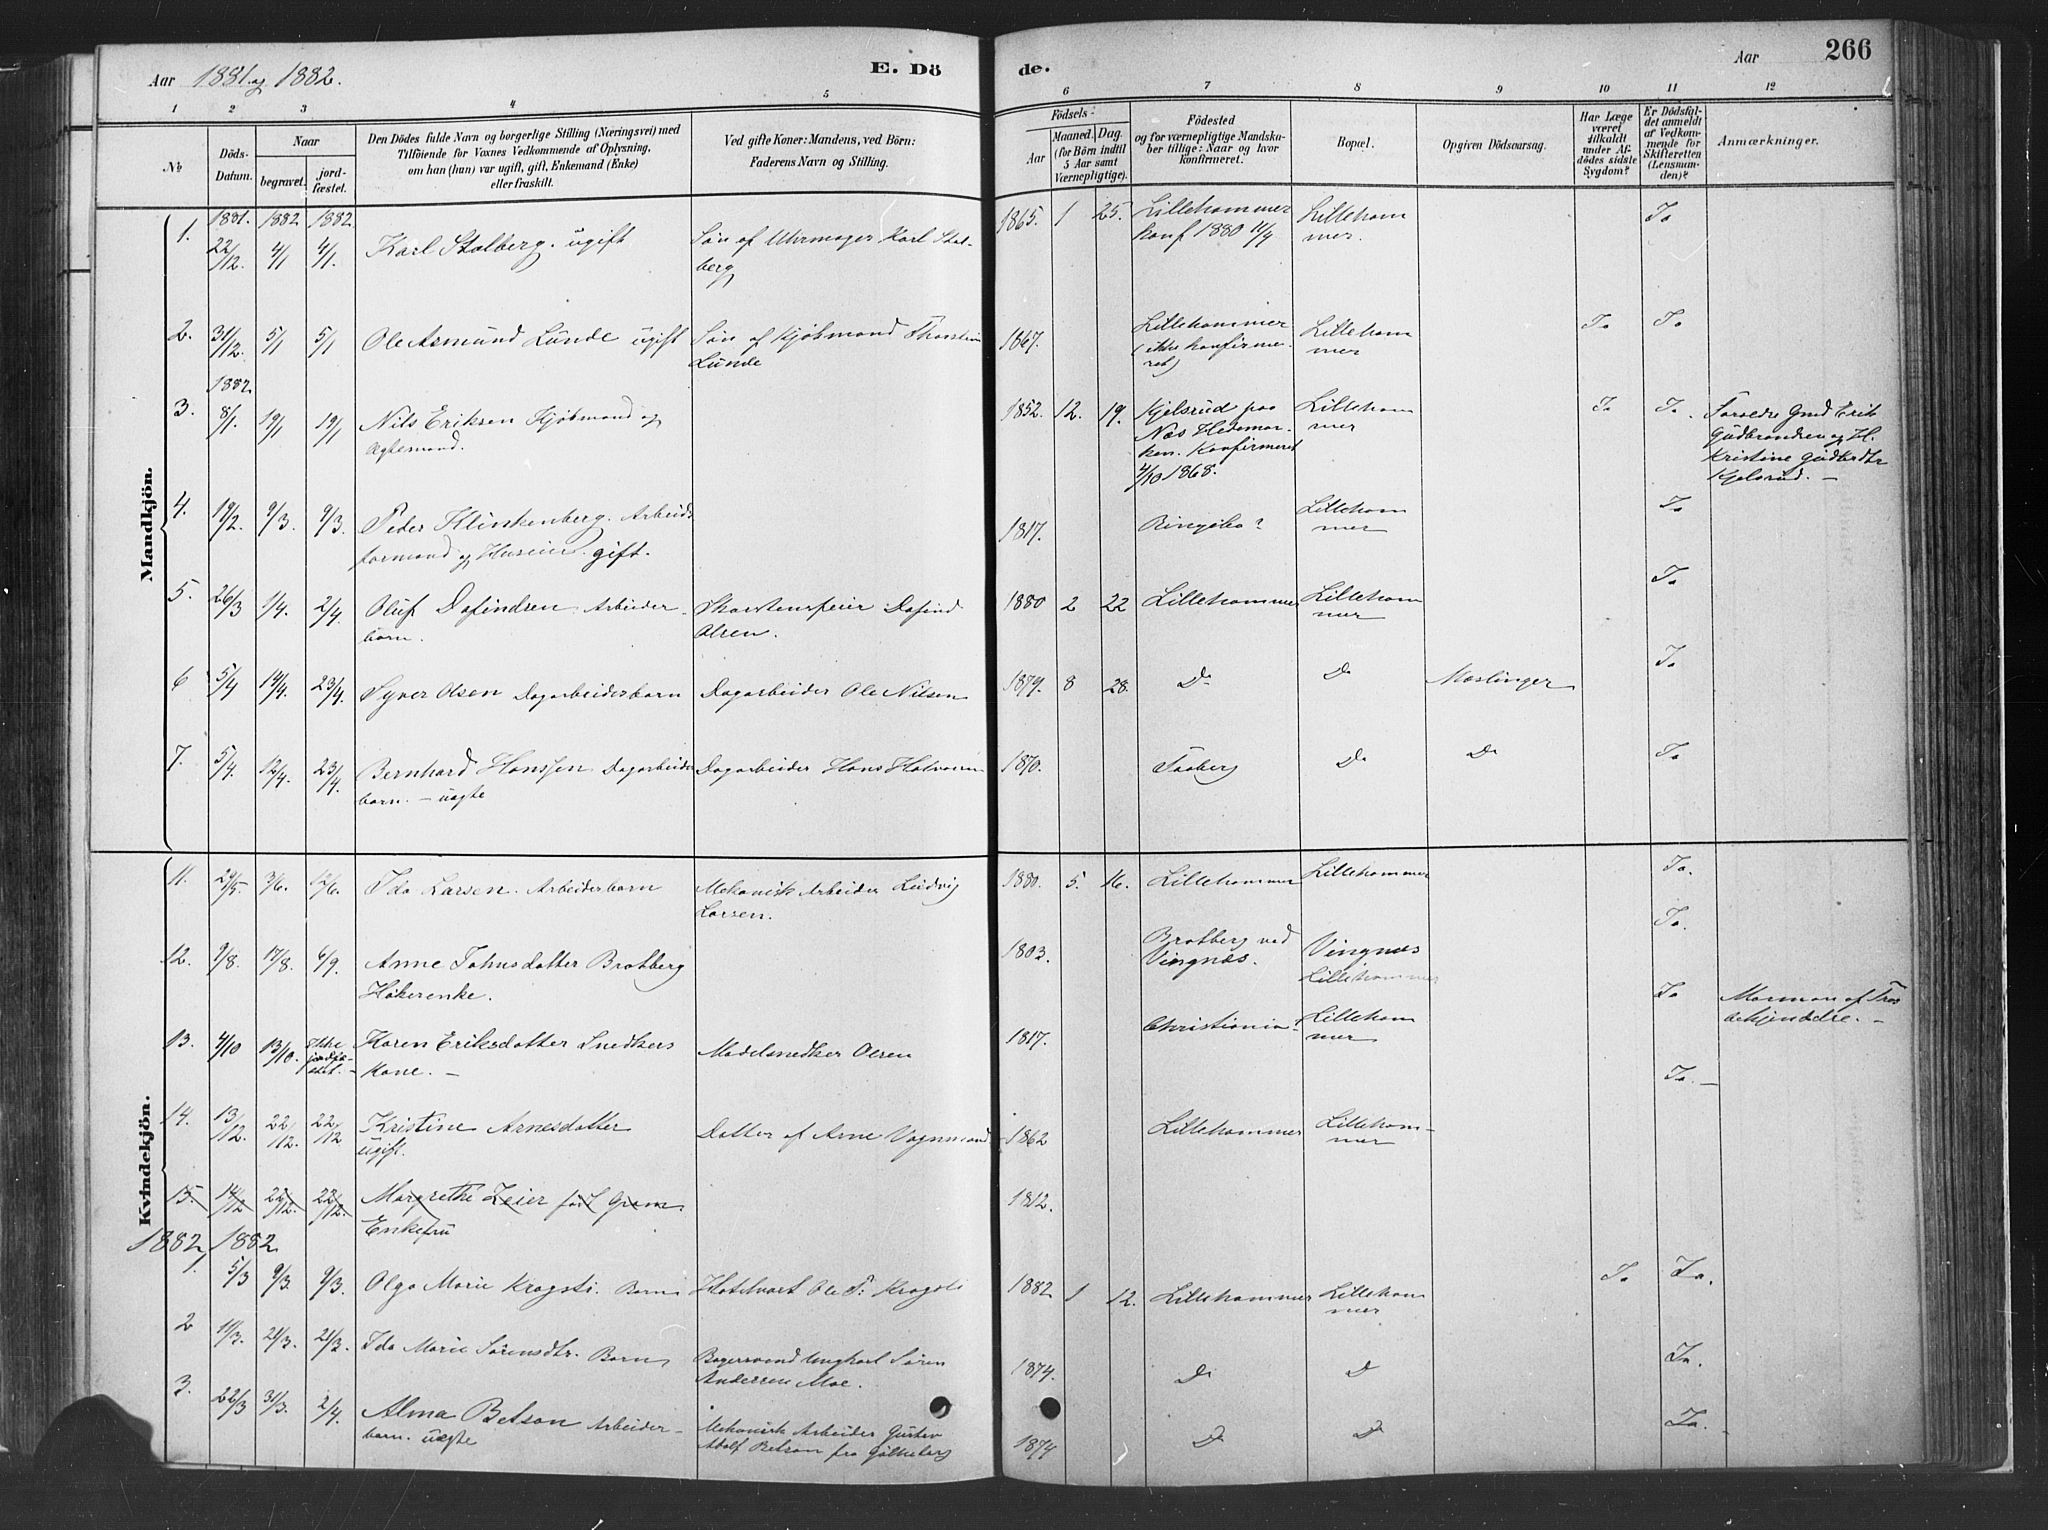 SAH, Fåberg prestekontor, H/Ha/Haa/L0010: Parish register (official) no. 10, 1879-1900, p. 266